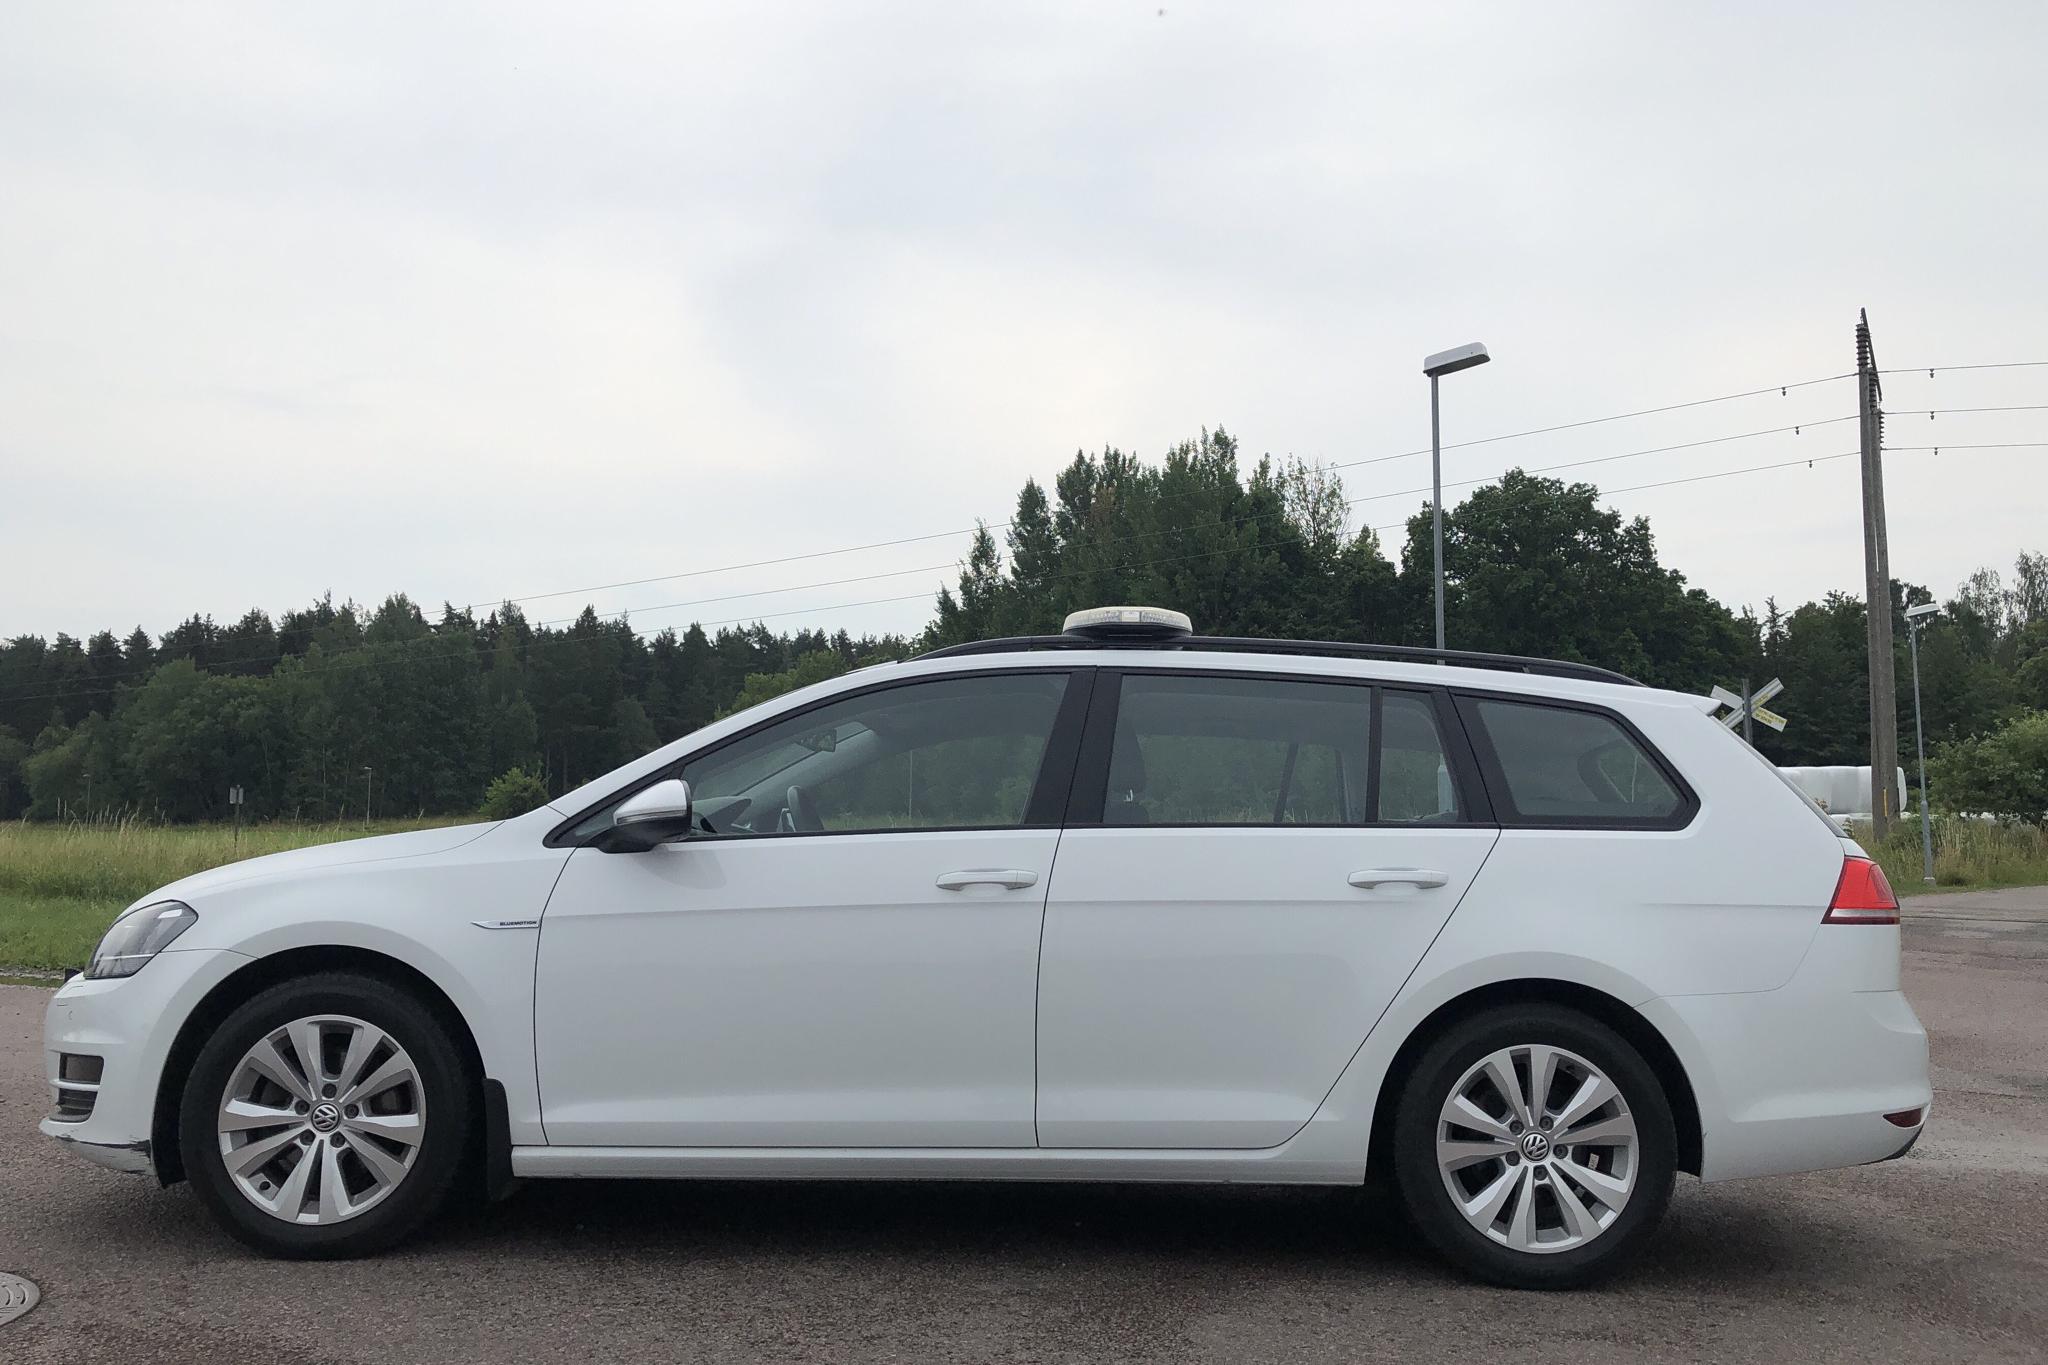 VW Golf VII 1.4 TGI BlueMotion Sportscombi (110hk) - 43 290 km - Automatic - white - 2016